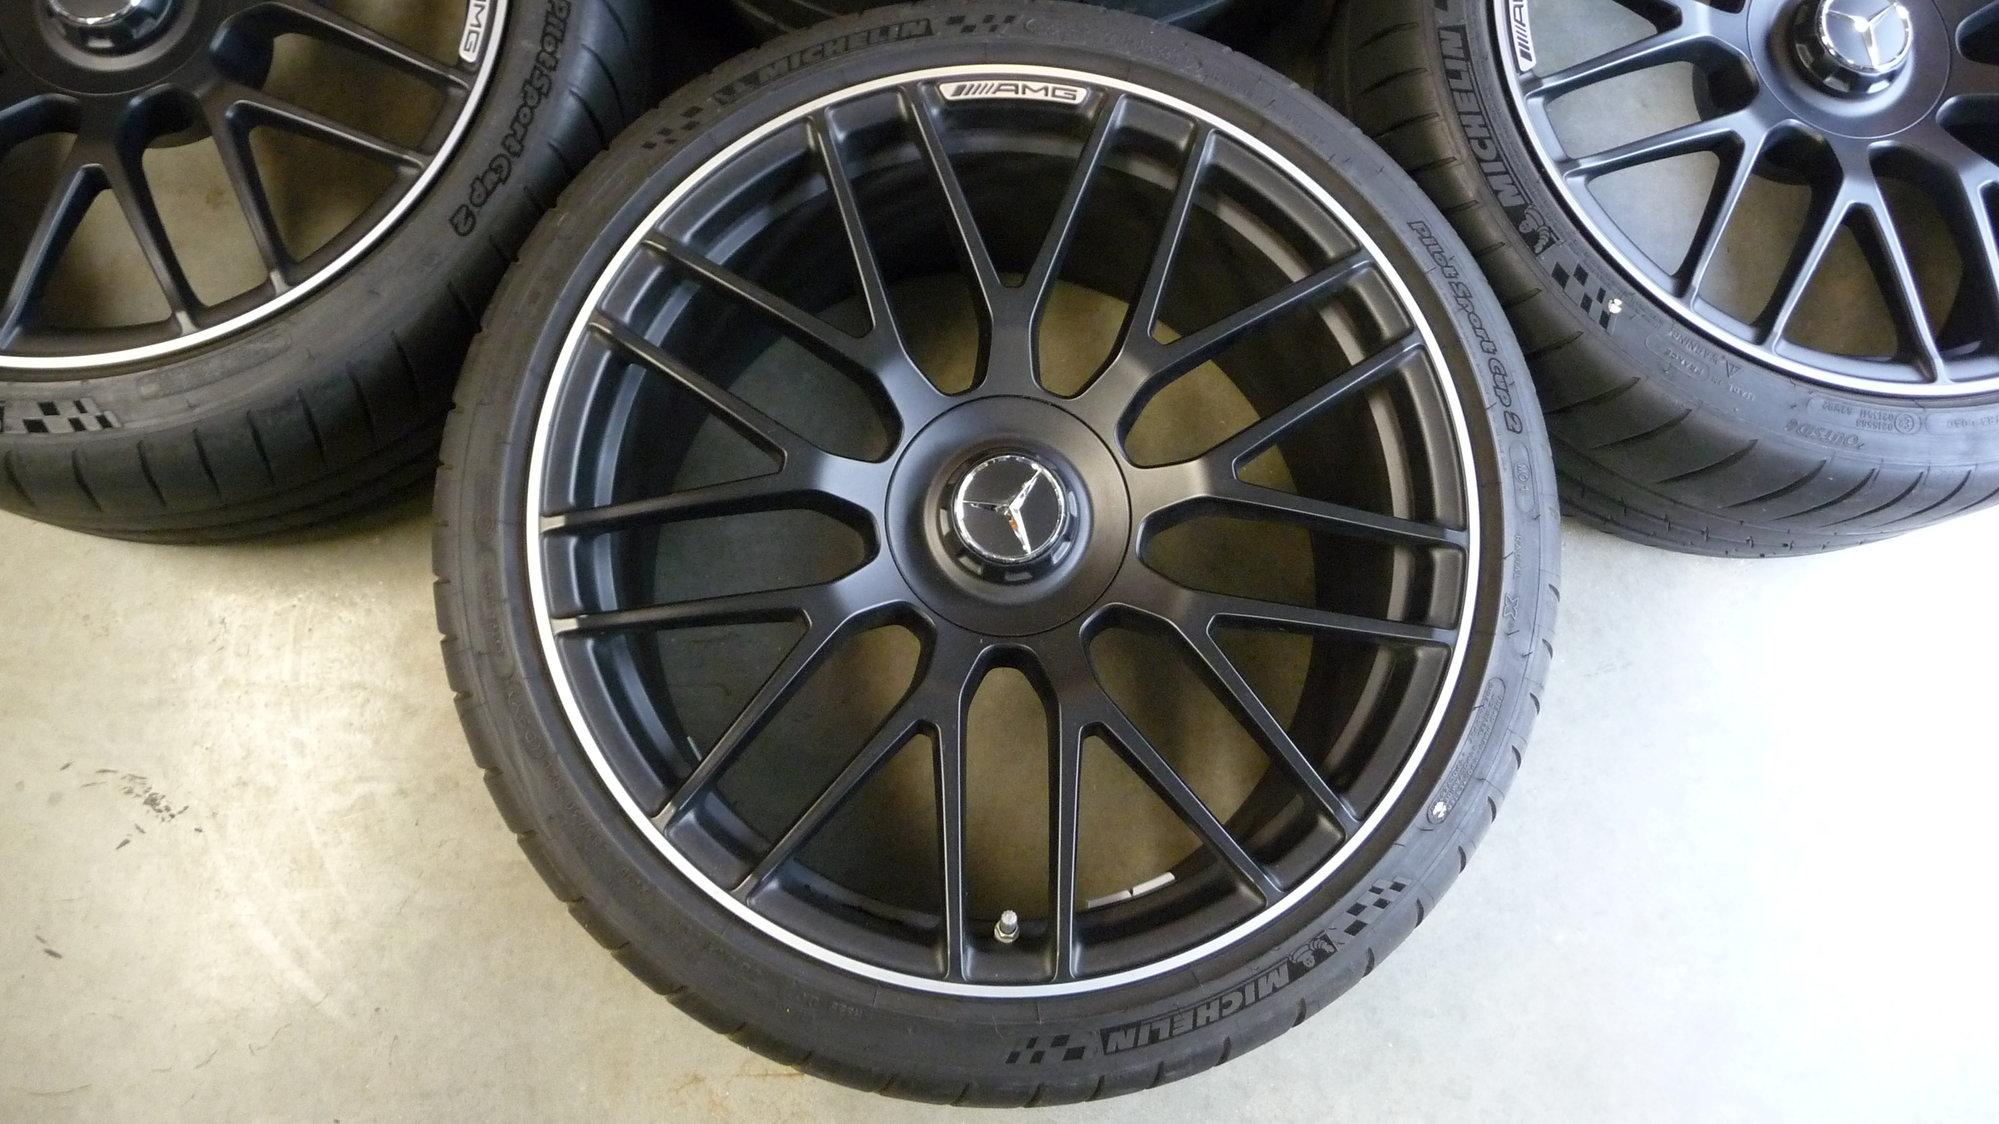 Michelin Pilot Sport >> AMG Black Cross-Spoked Wheels 4 Sale - MBWorld.org Forums